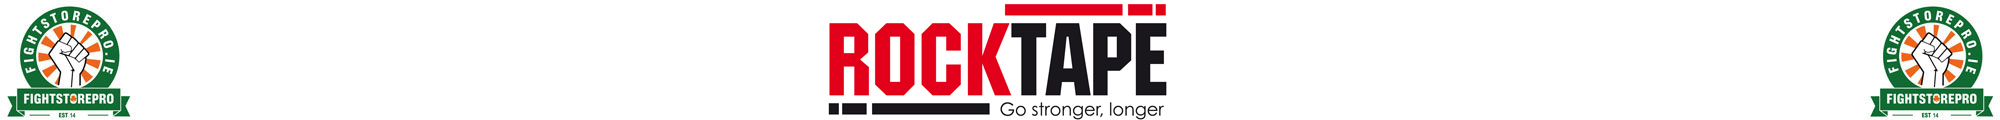 RockTape - Fightstore PRO Ireland